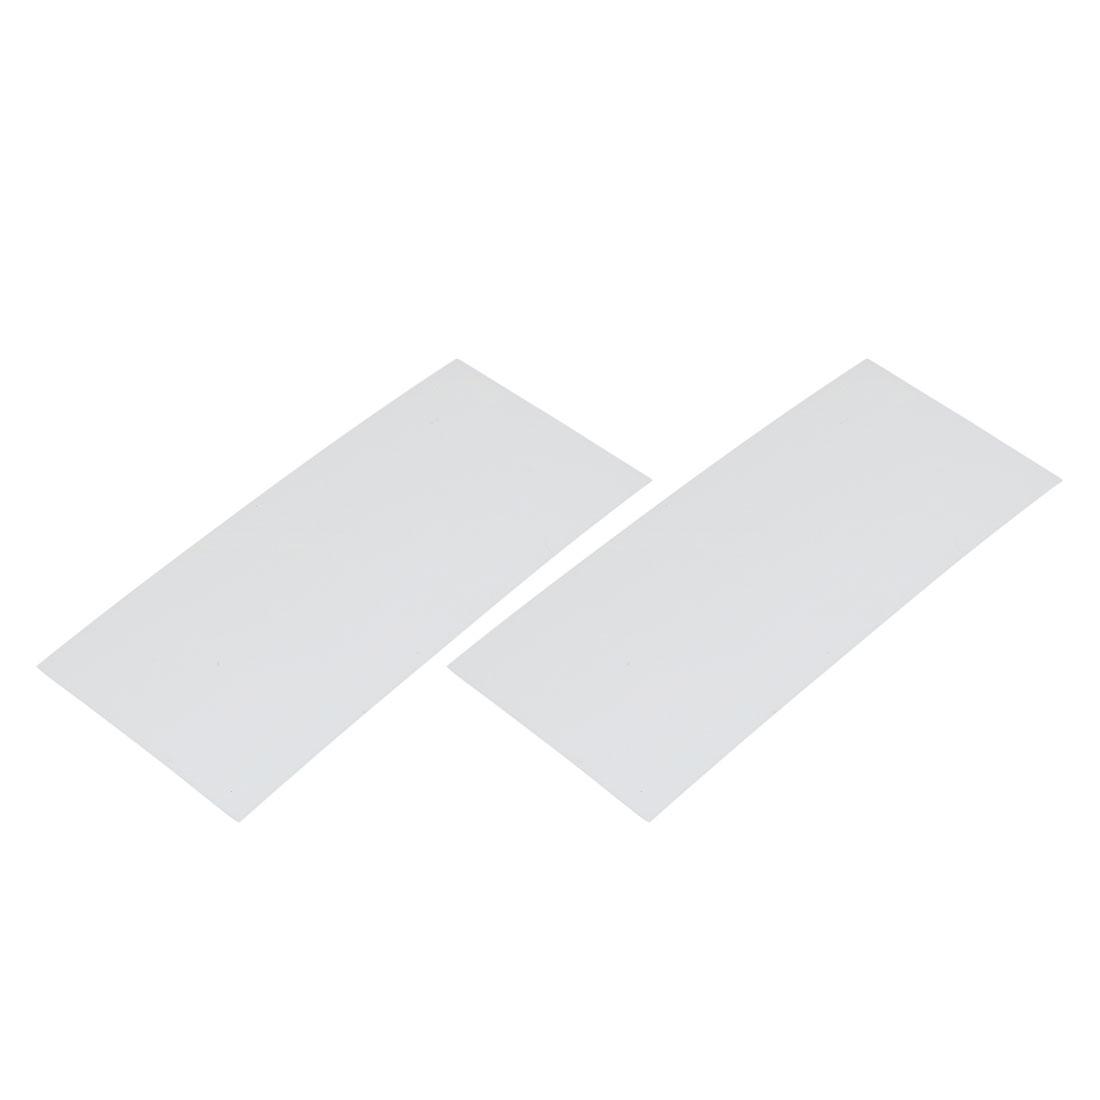 2pcs 23mm Flat Width 53mm Long PVC Heat Shrinkable Tube White for AA Battery